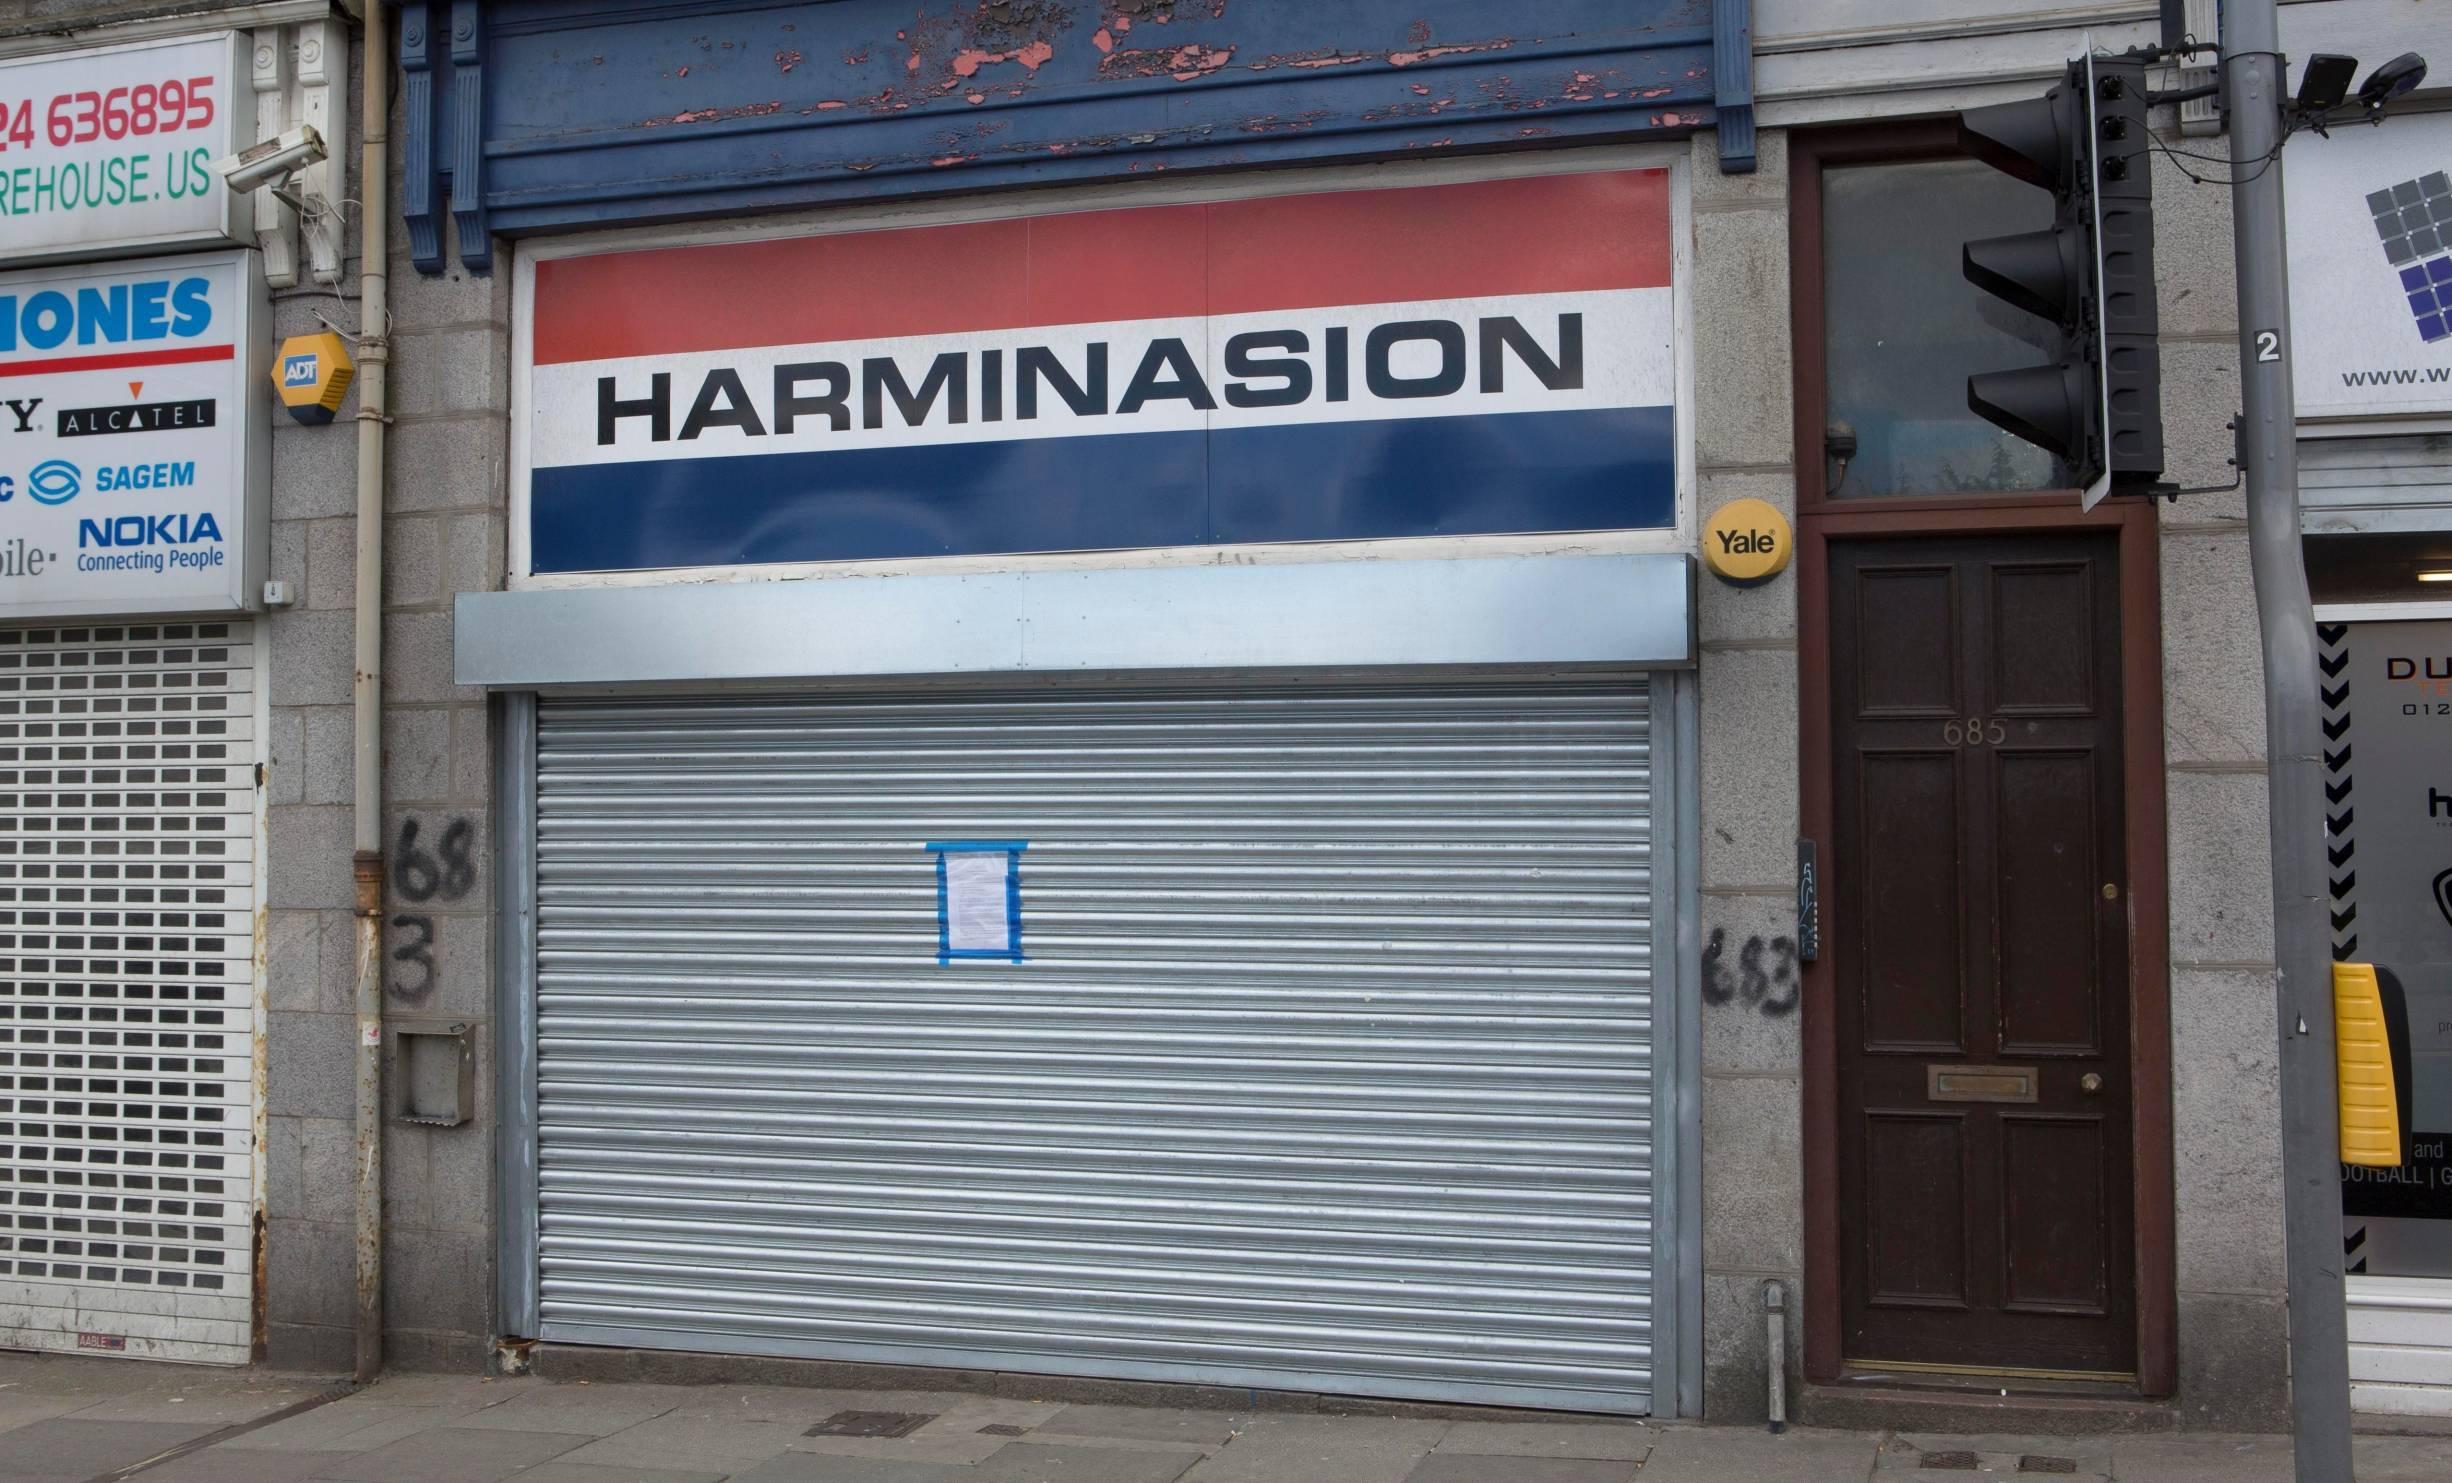 Harminasion on George Street today